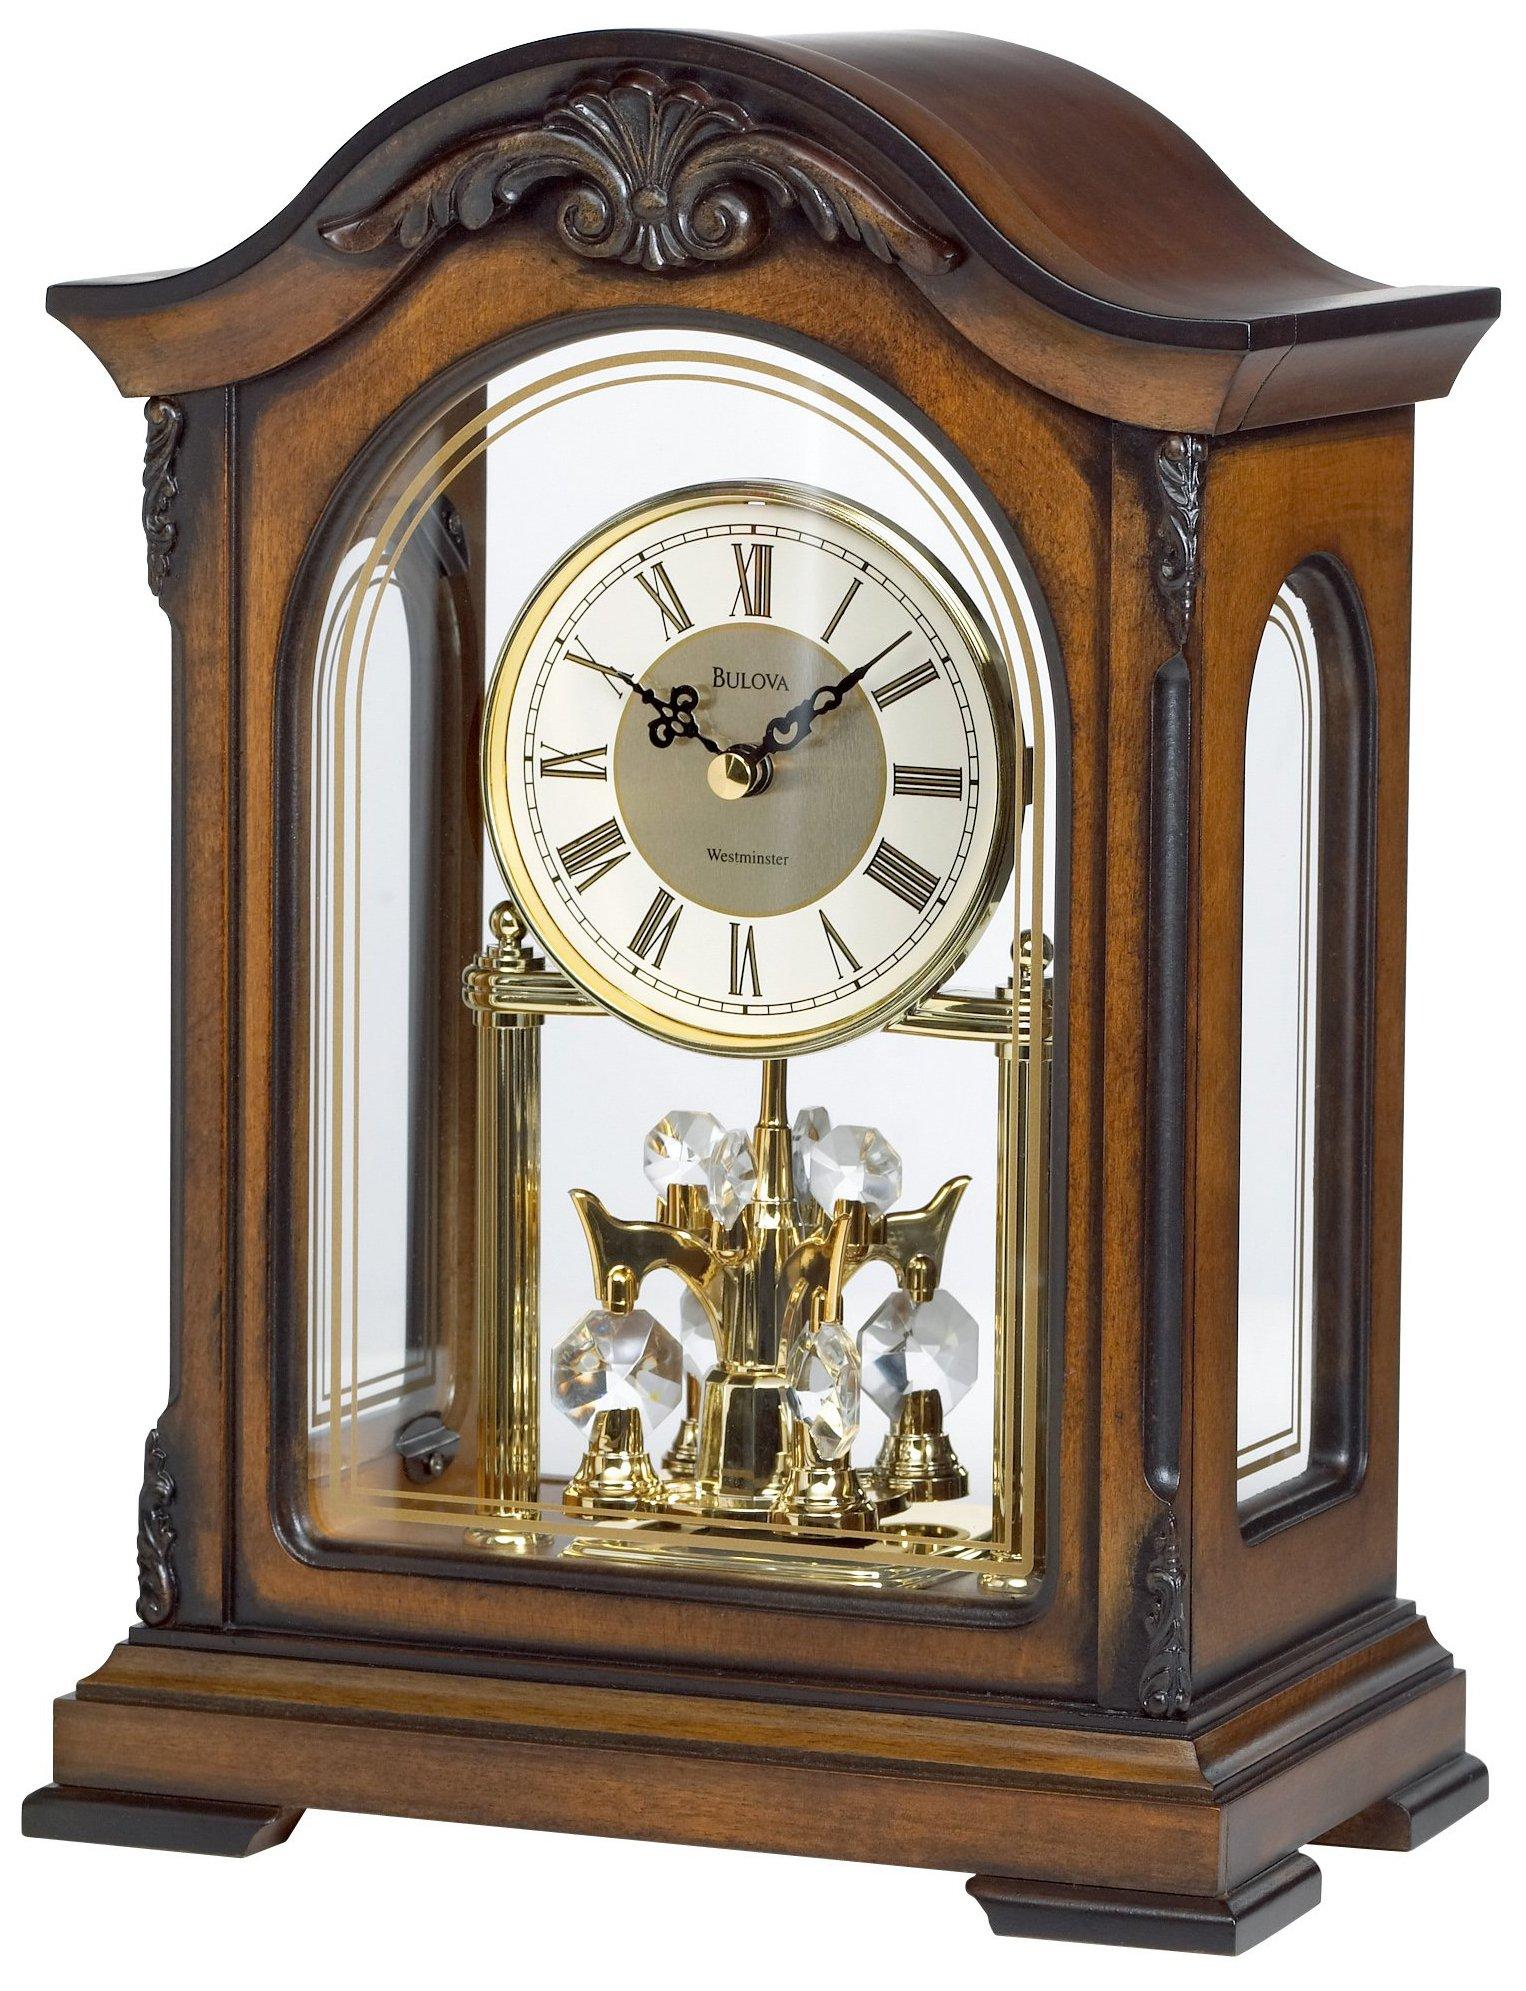 Bulova B1845 Durant Old World Clock, Walnut Finish by Bulova (Image #1)